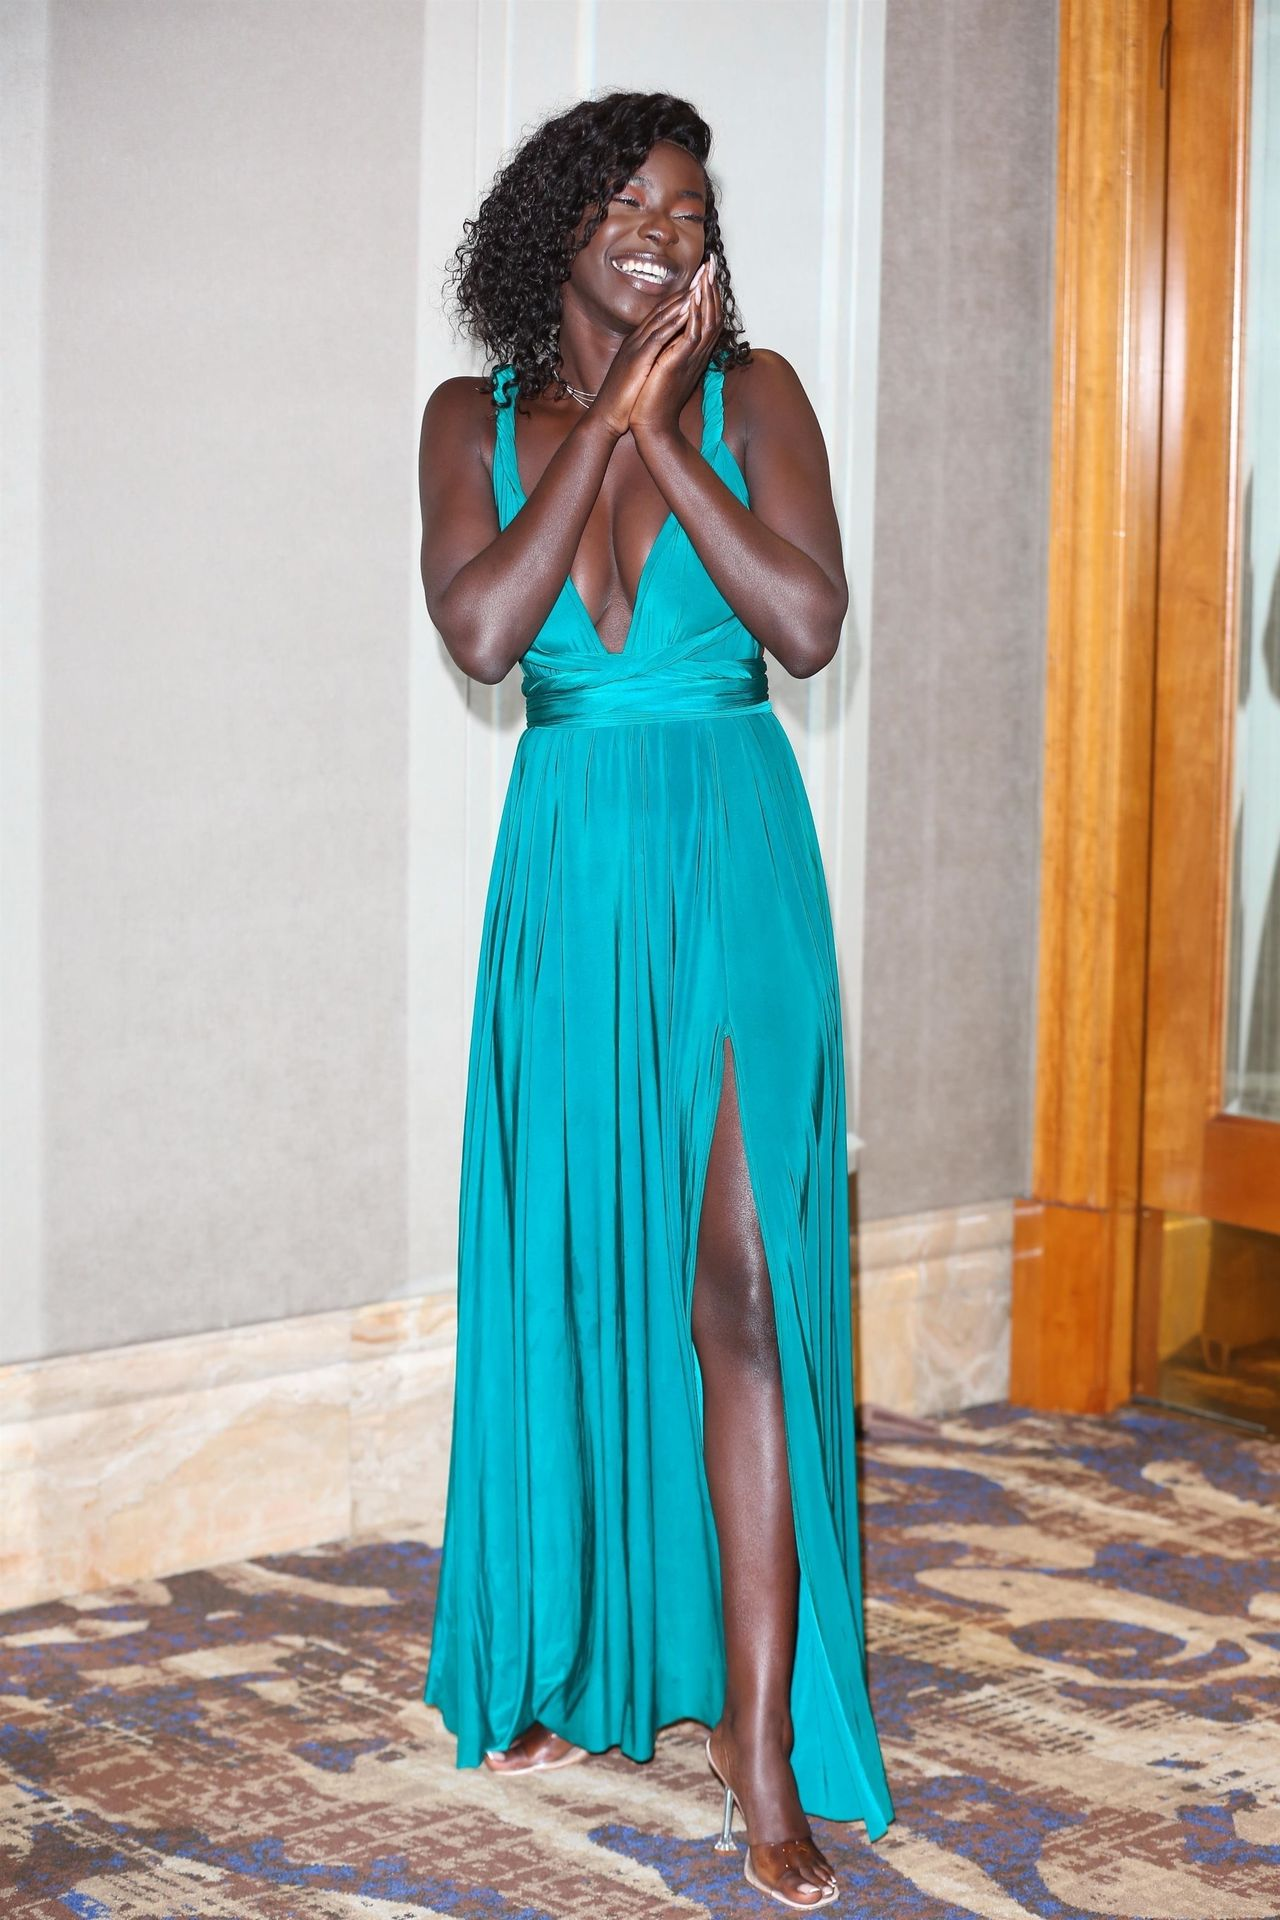 Mike Boateng & Priscilla Anyabu Are Seen At British Ethnic Diversity Sports Awards 0166